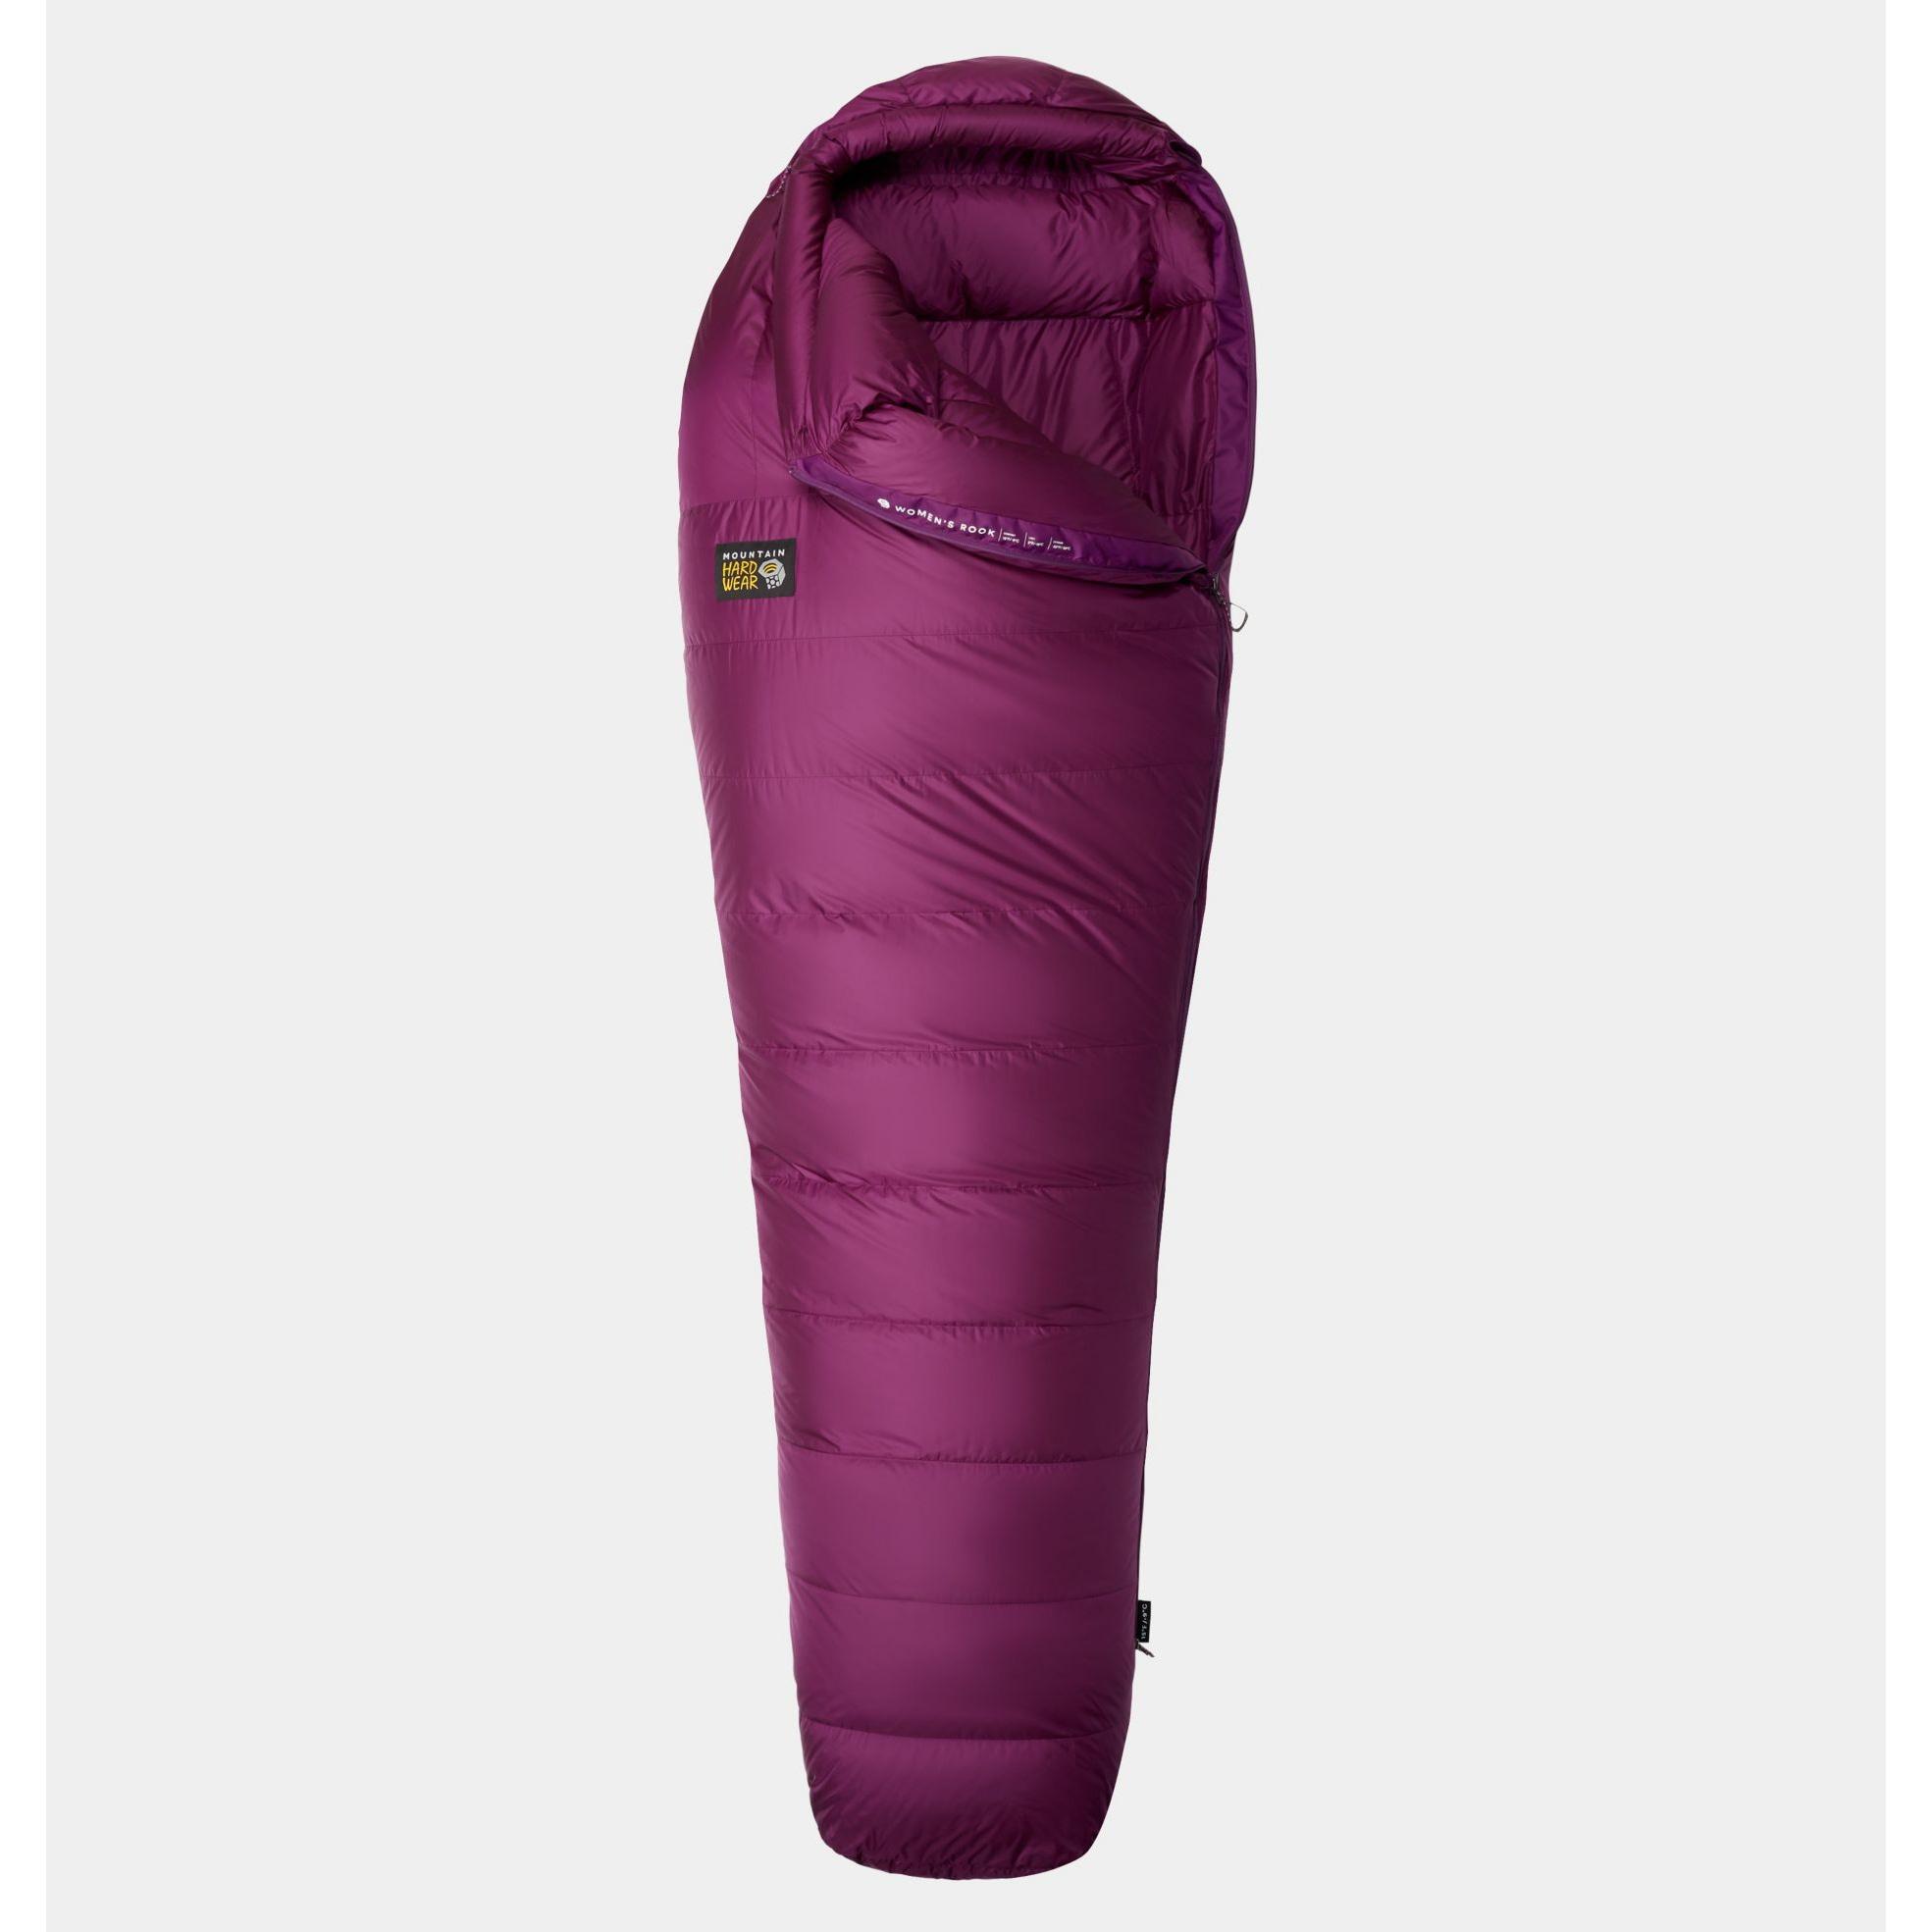 Rook 15 Regular Sleeping Bag - Cosmos Purple